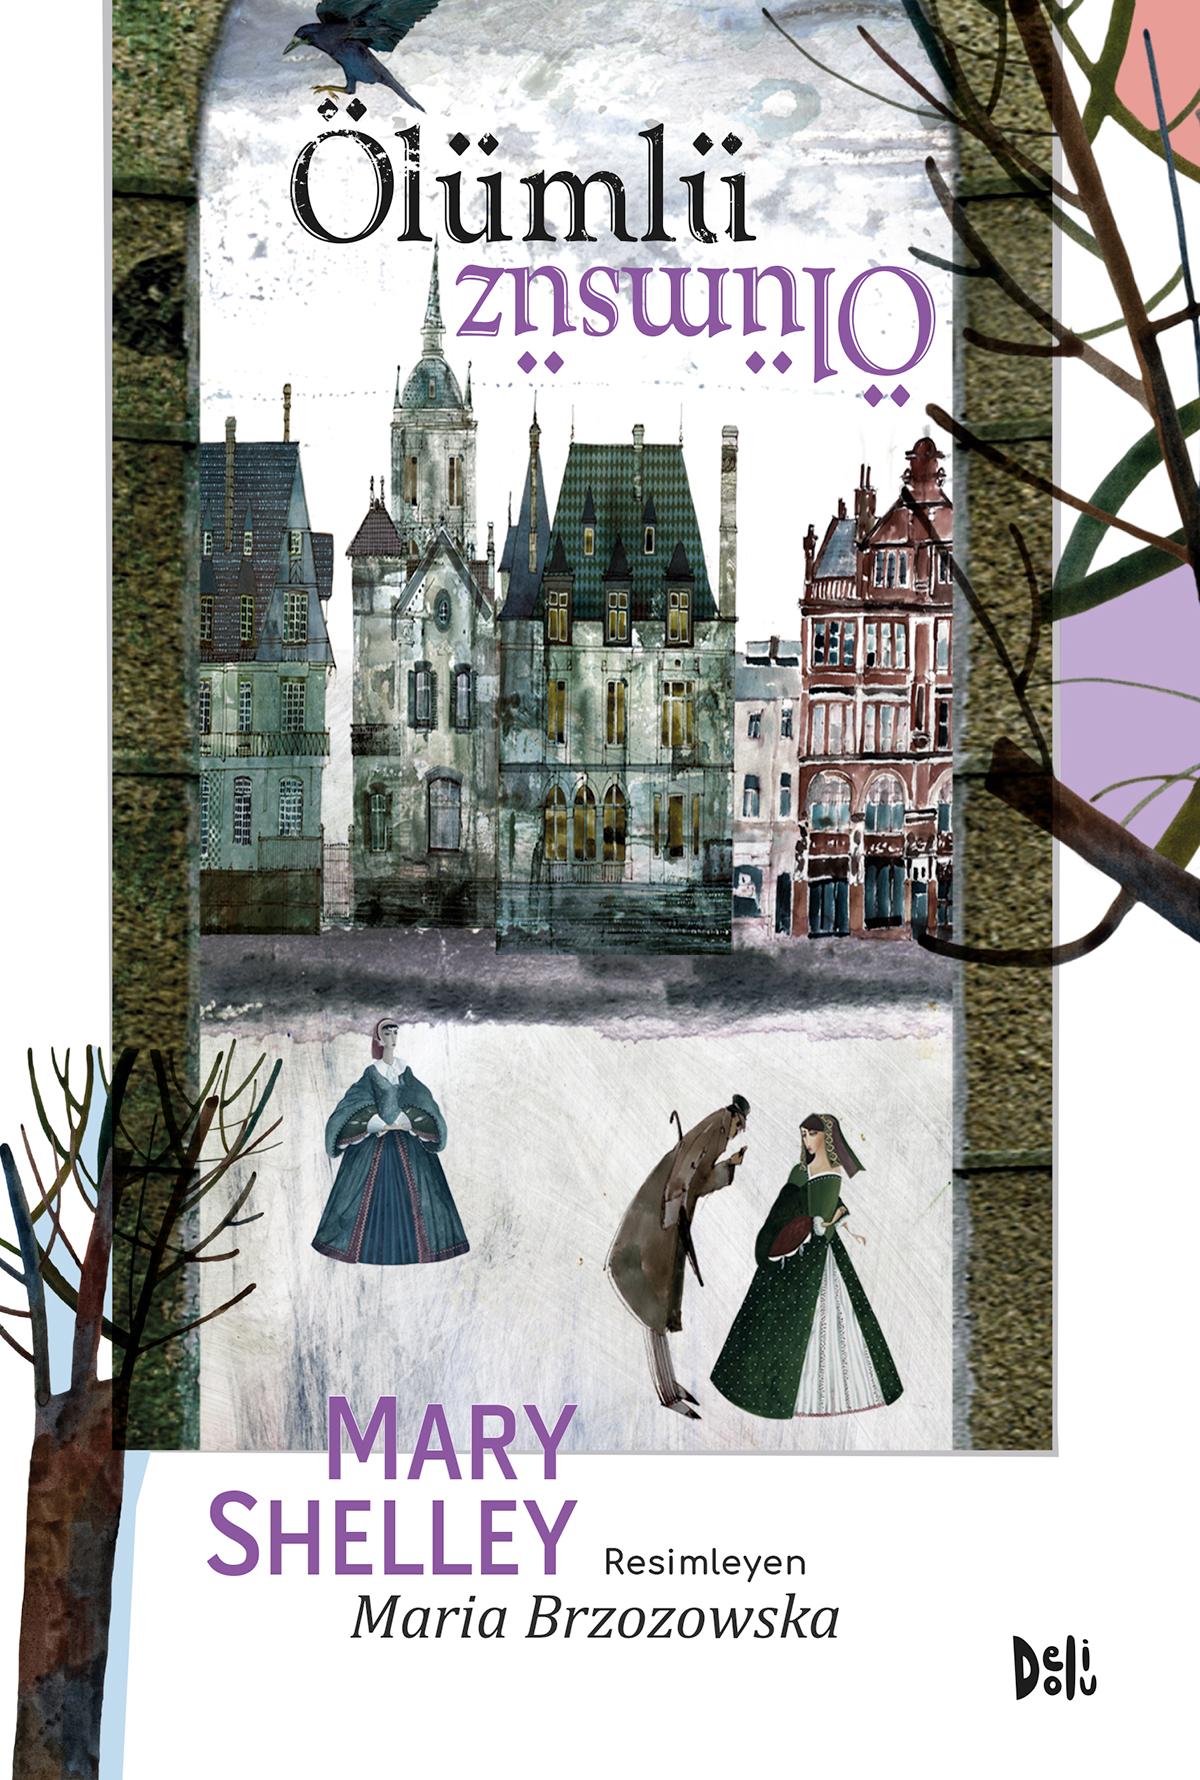 book book cover book design book illustrations illustrations Immortal elixir photoshop Illustrator design